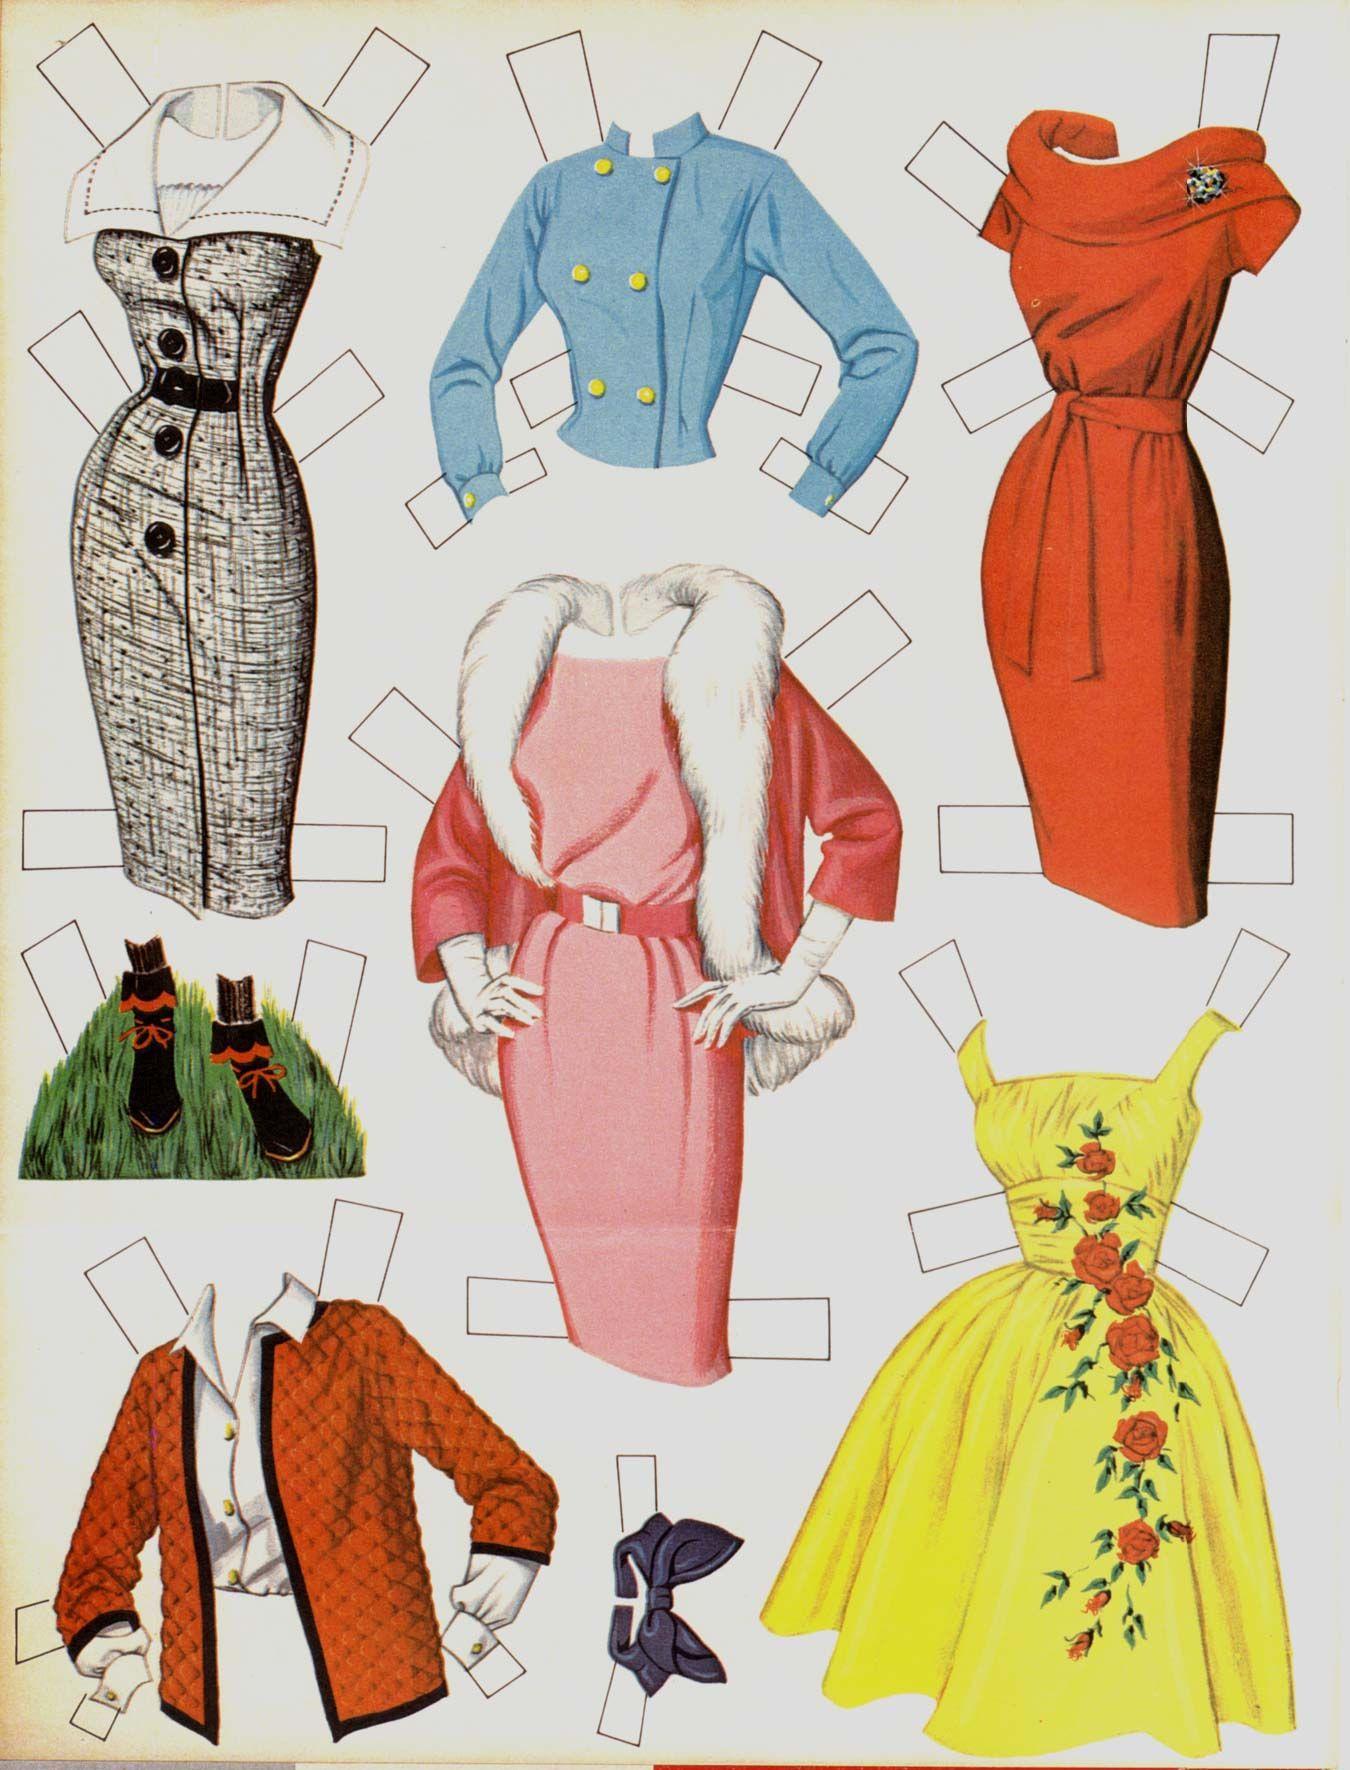 Vintage Connie Francis Paper Doll Page 2 Paper Dolls 1950 S 1960 S Fashion Barbie Paper Dolls Paper Doll Costume Paper Dolls